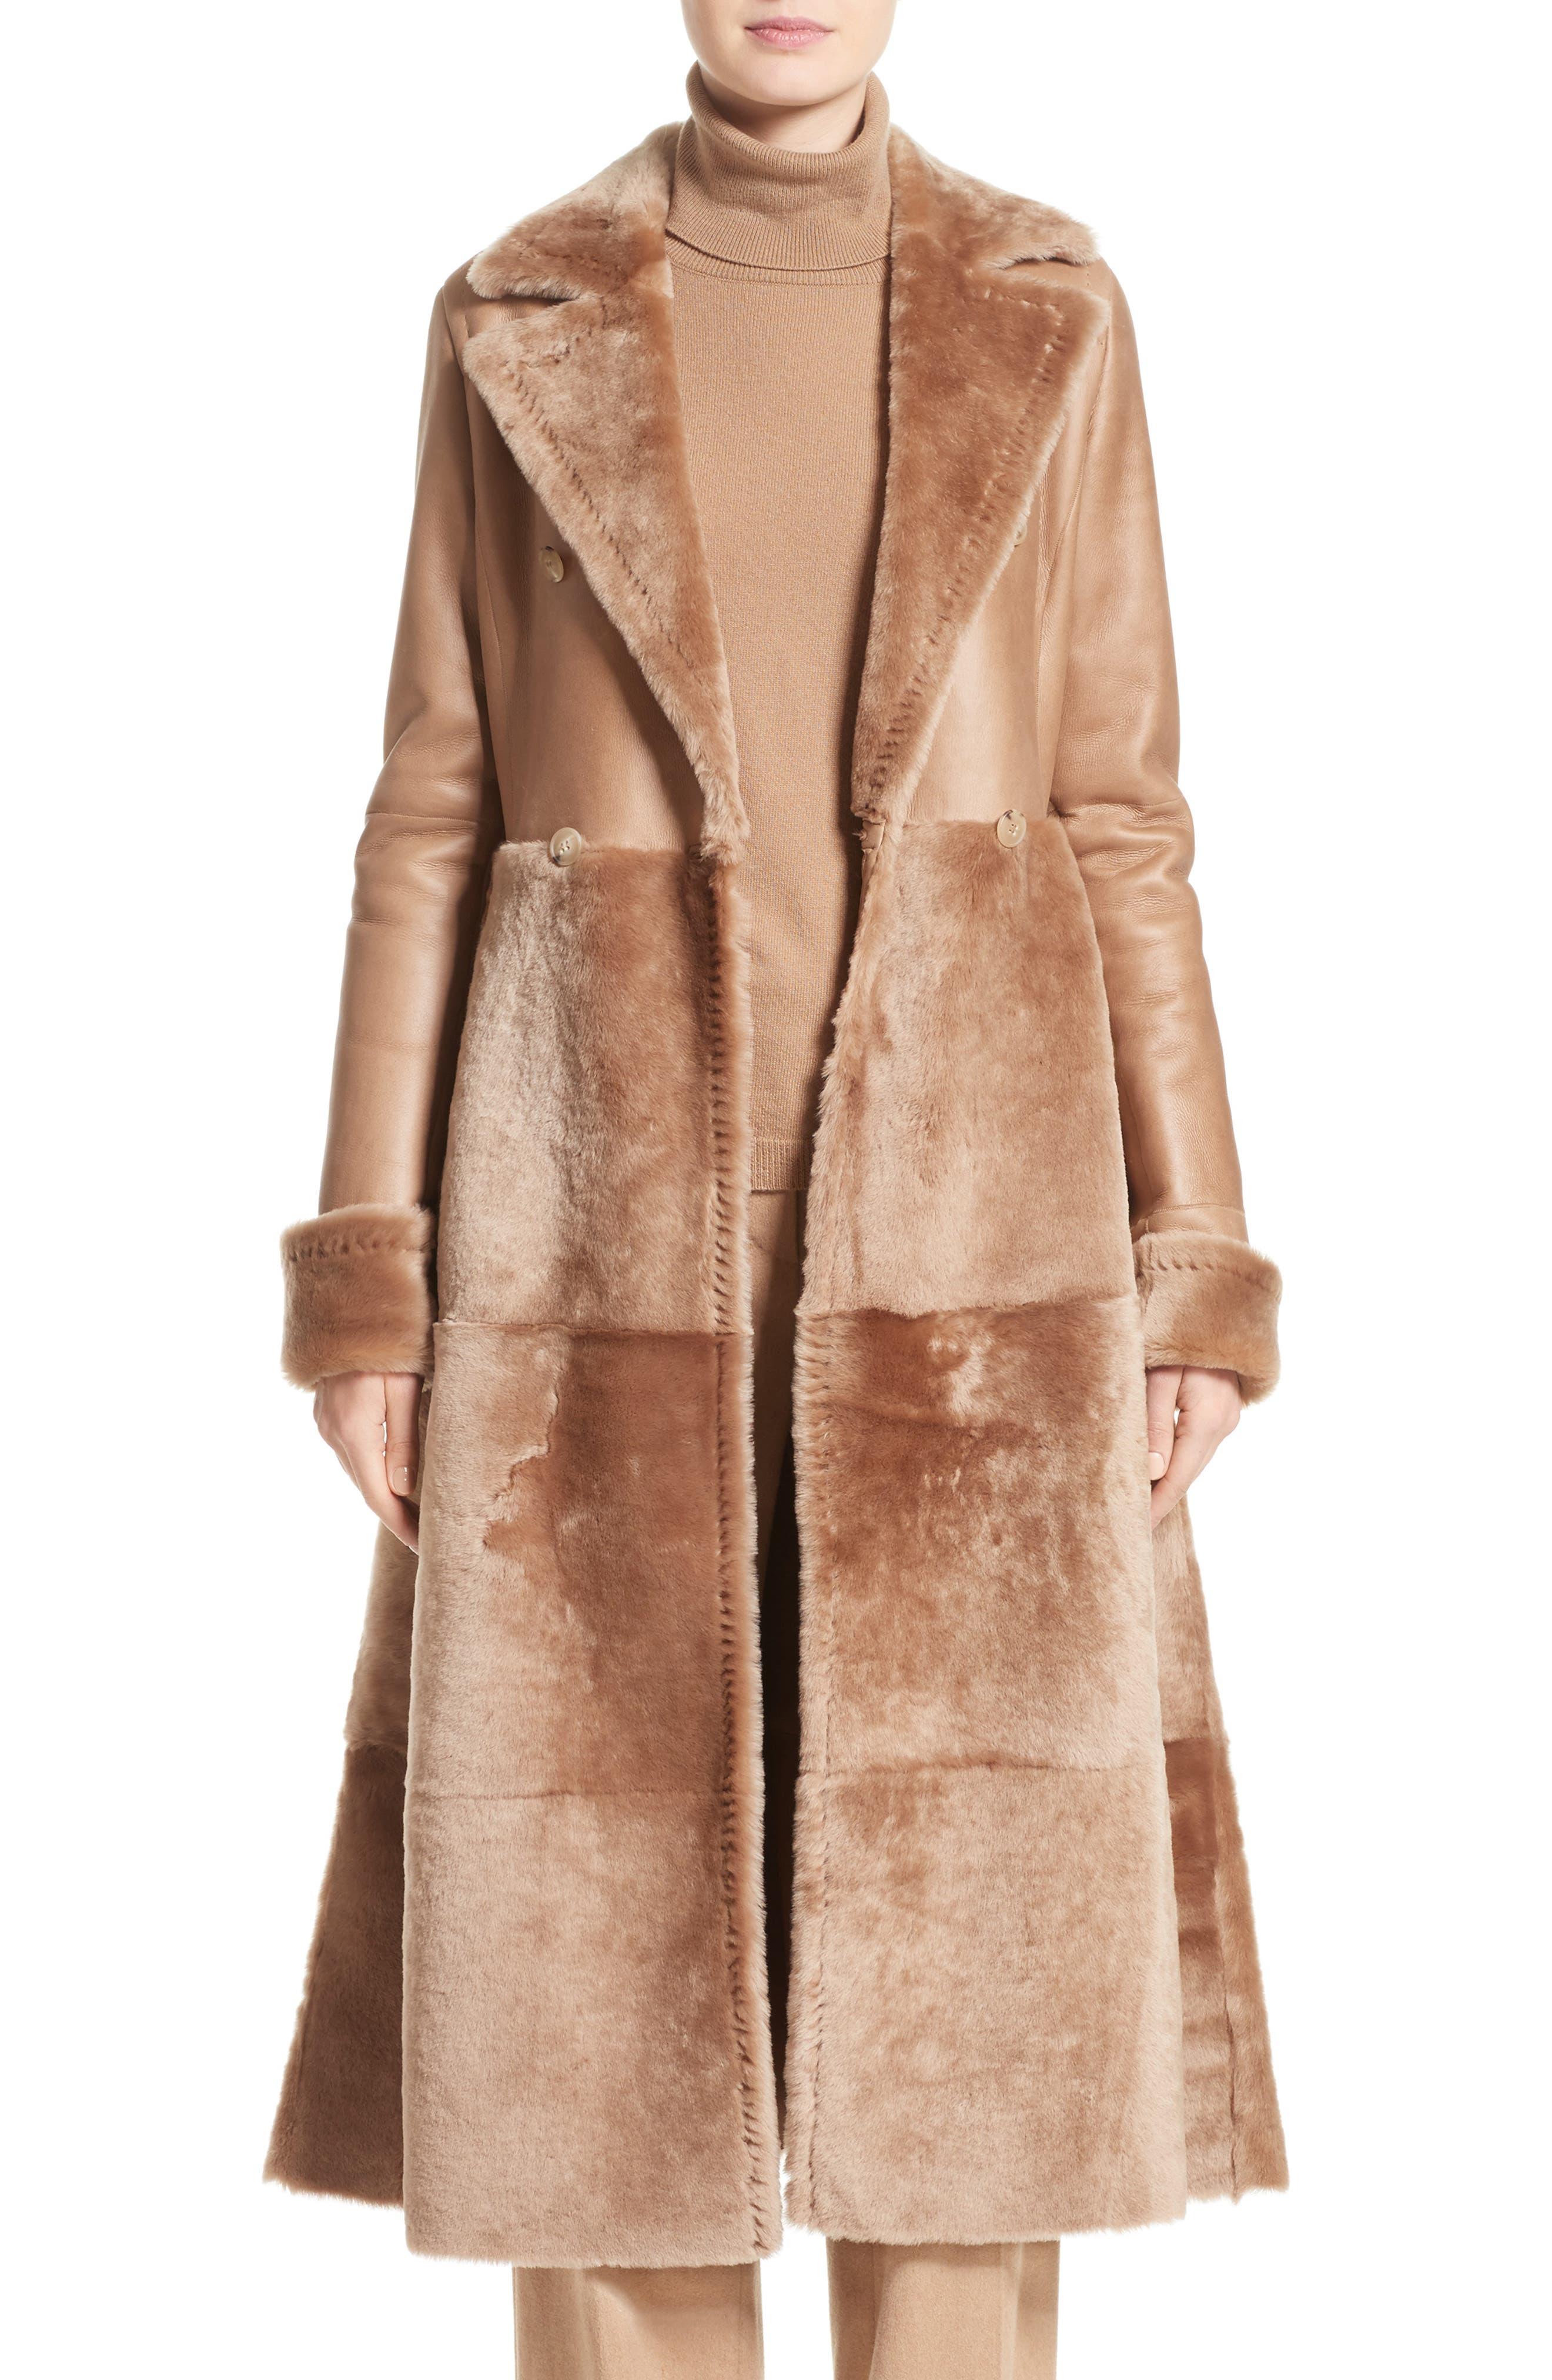 MAX MARA, Rimini Genuine Shearling Coat, Main thumbnail 1, color, CAMEL